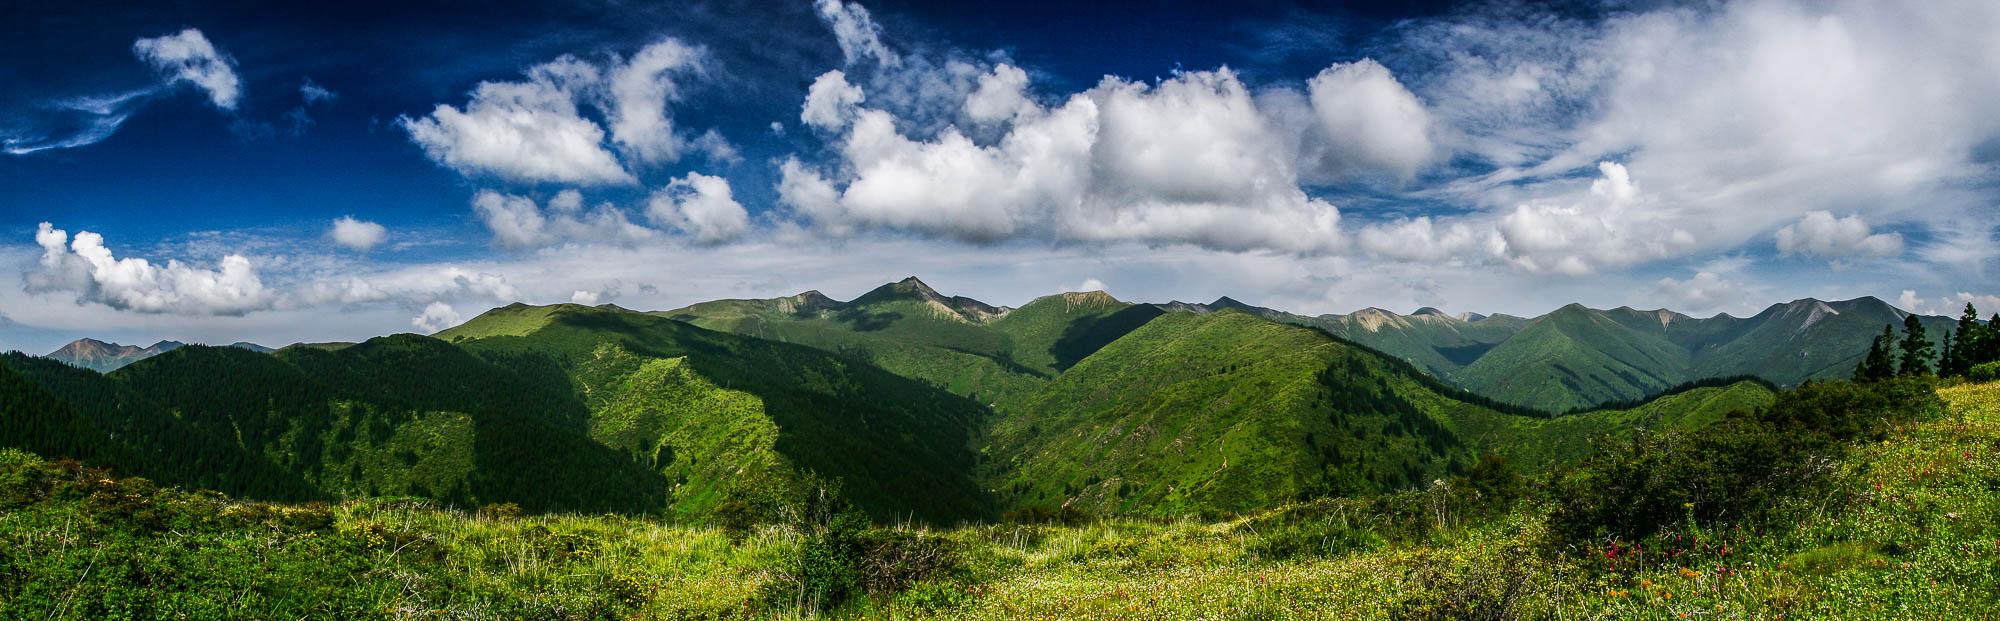 CHINA_Panoramas_jusmedic - 2